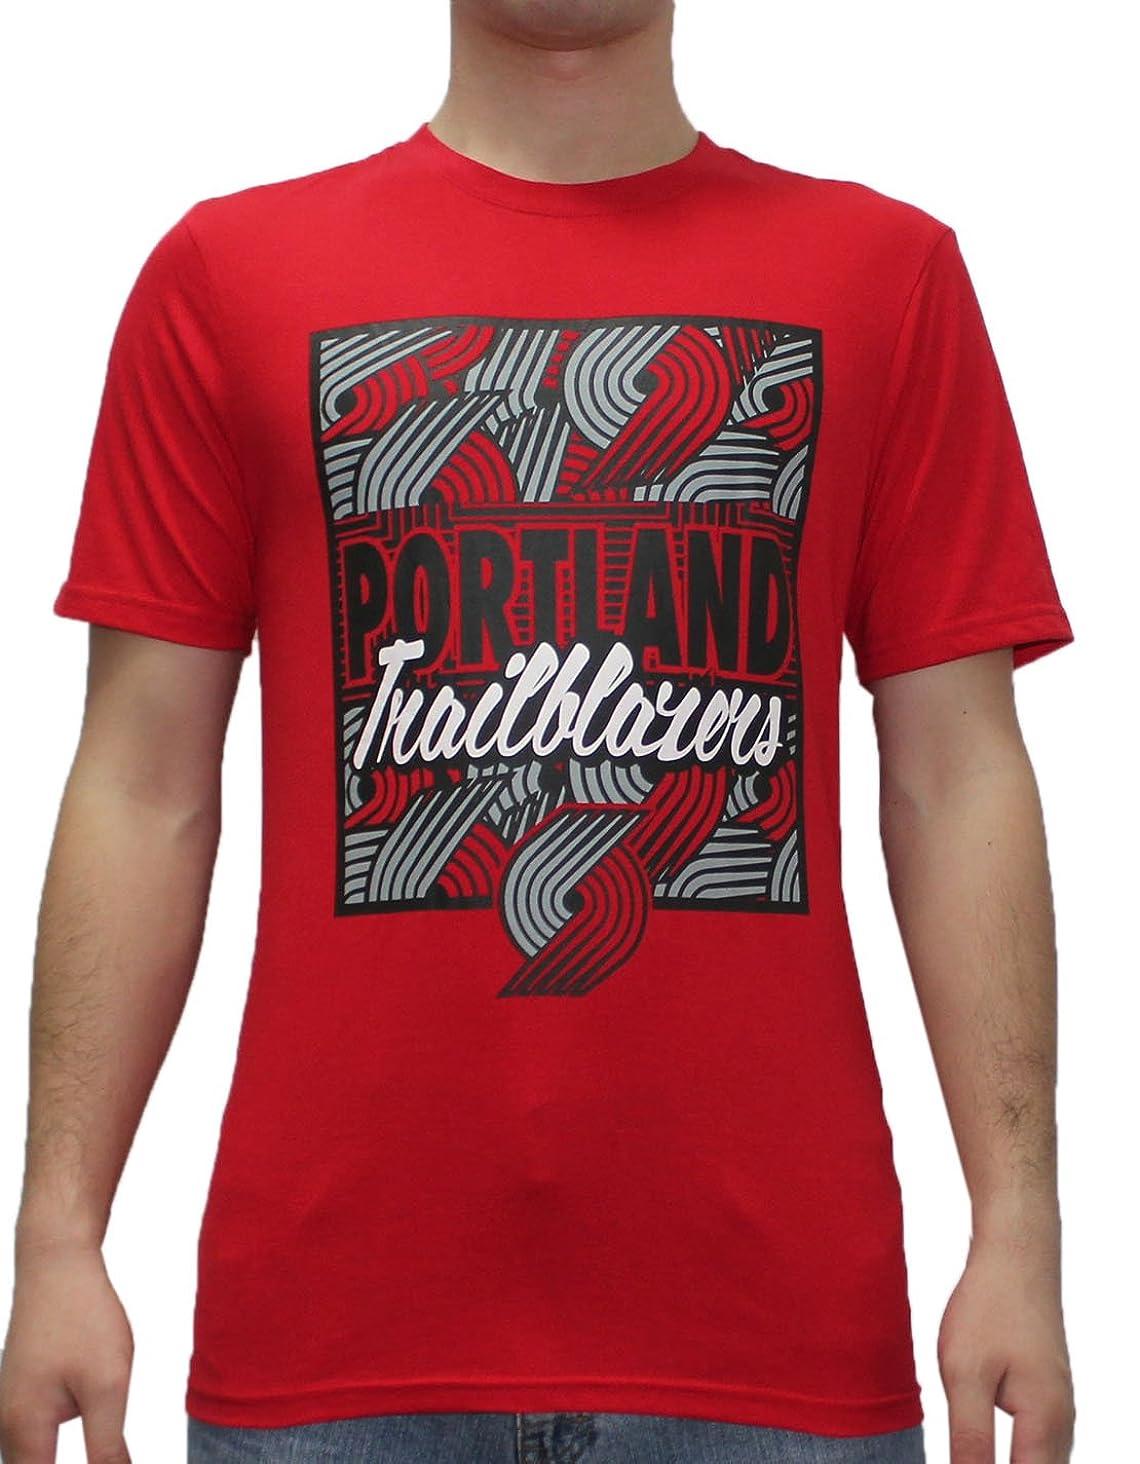 NBA Mens PORTLAND TRAIL BLAZERS: Athletic Short Sleeve T Shirt